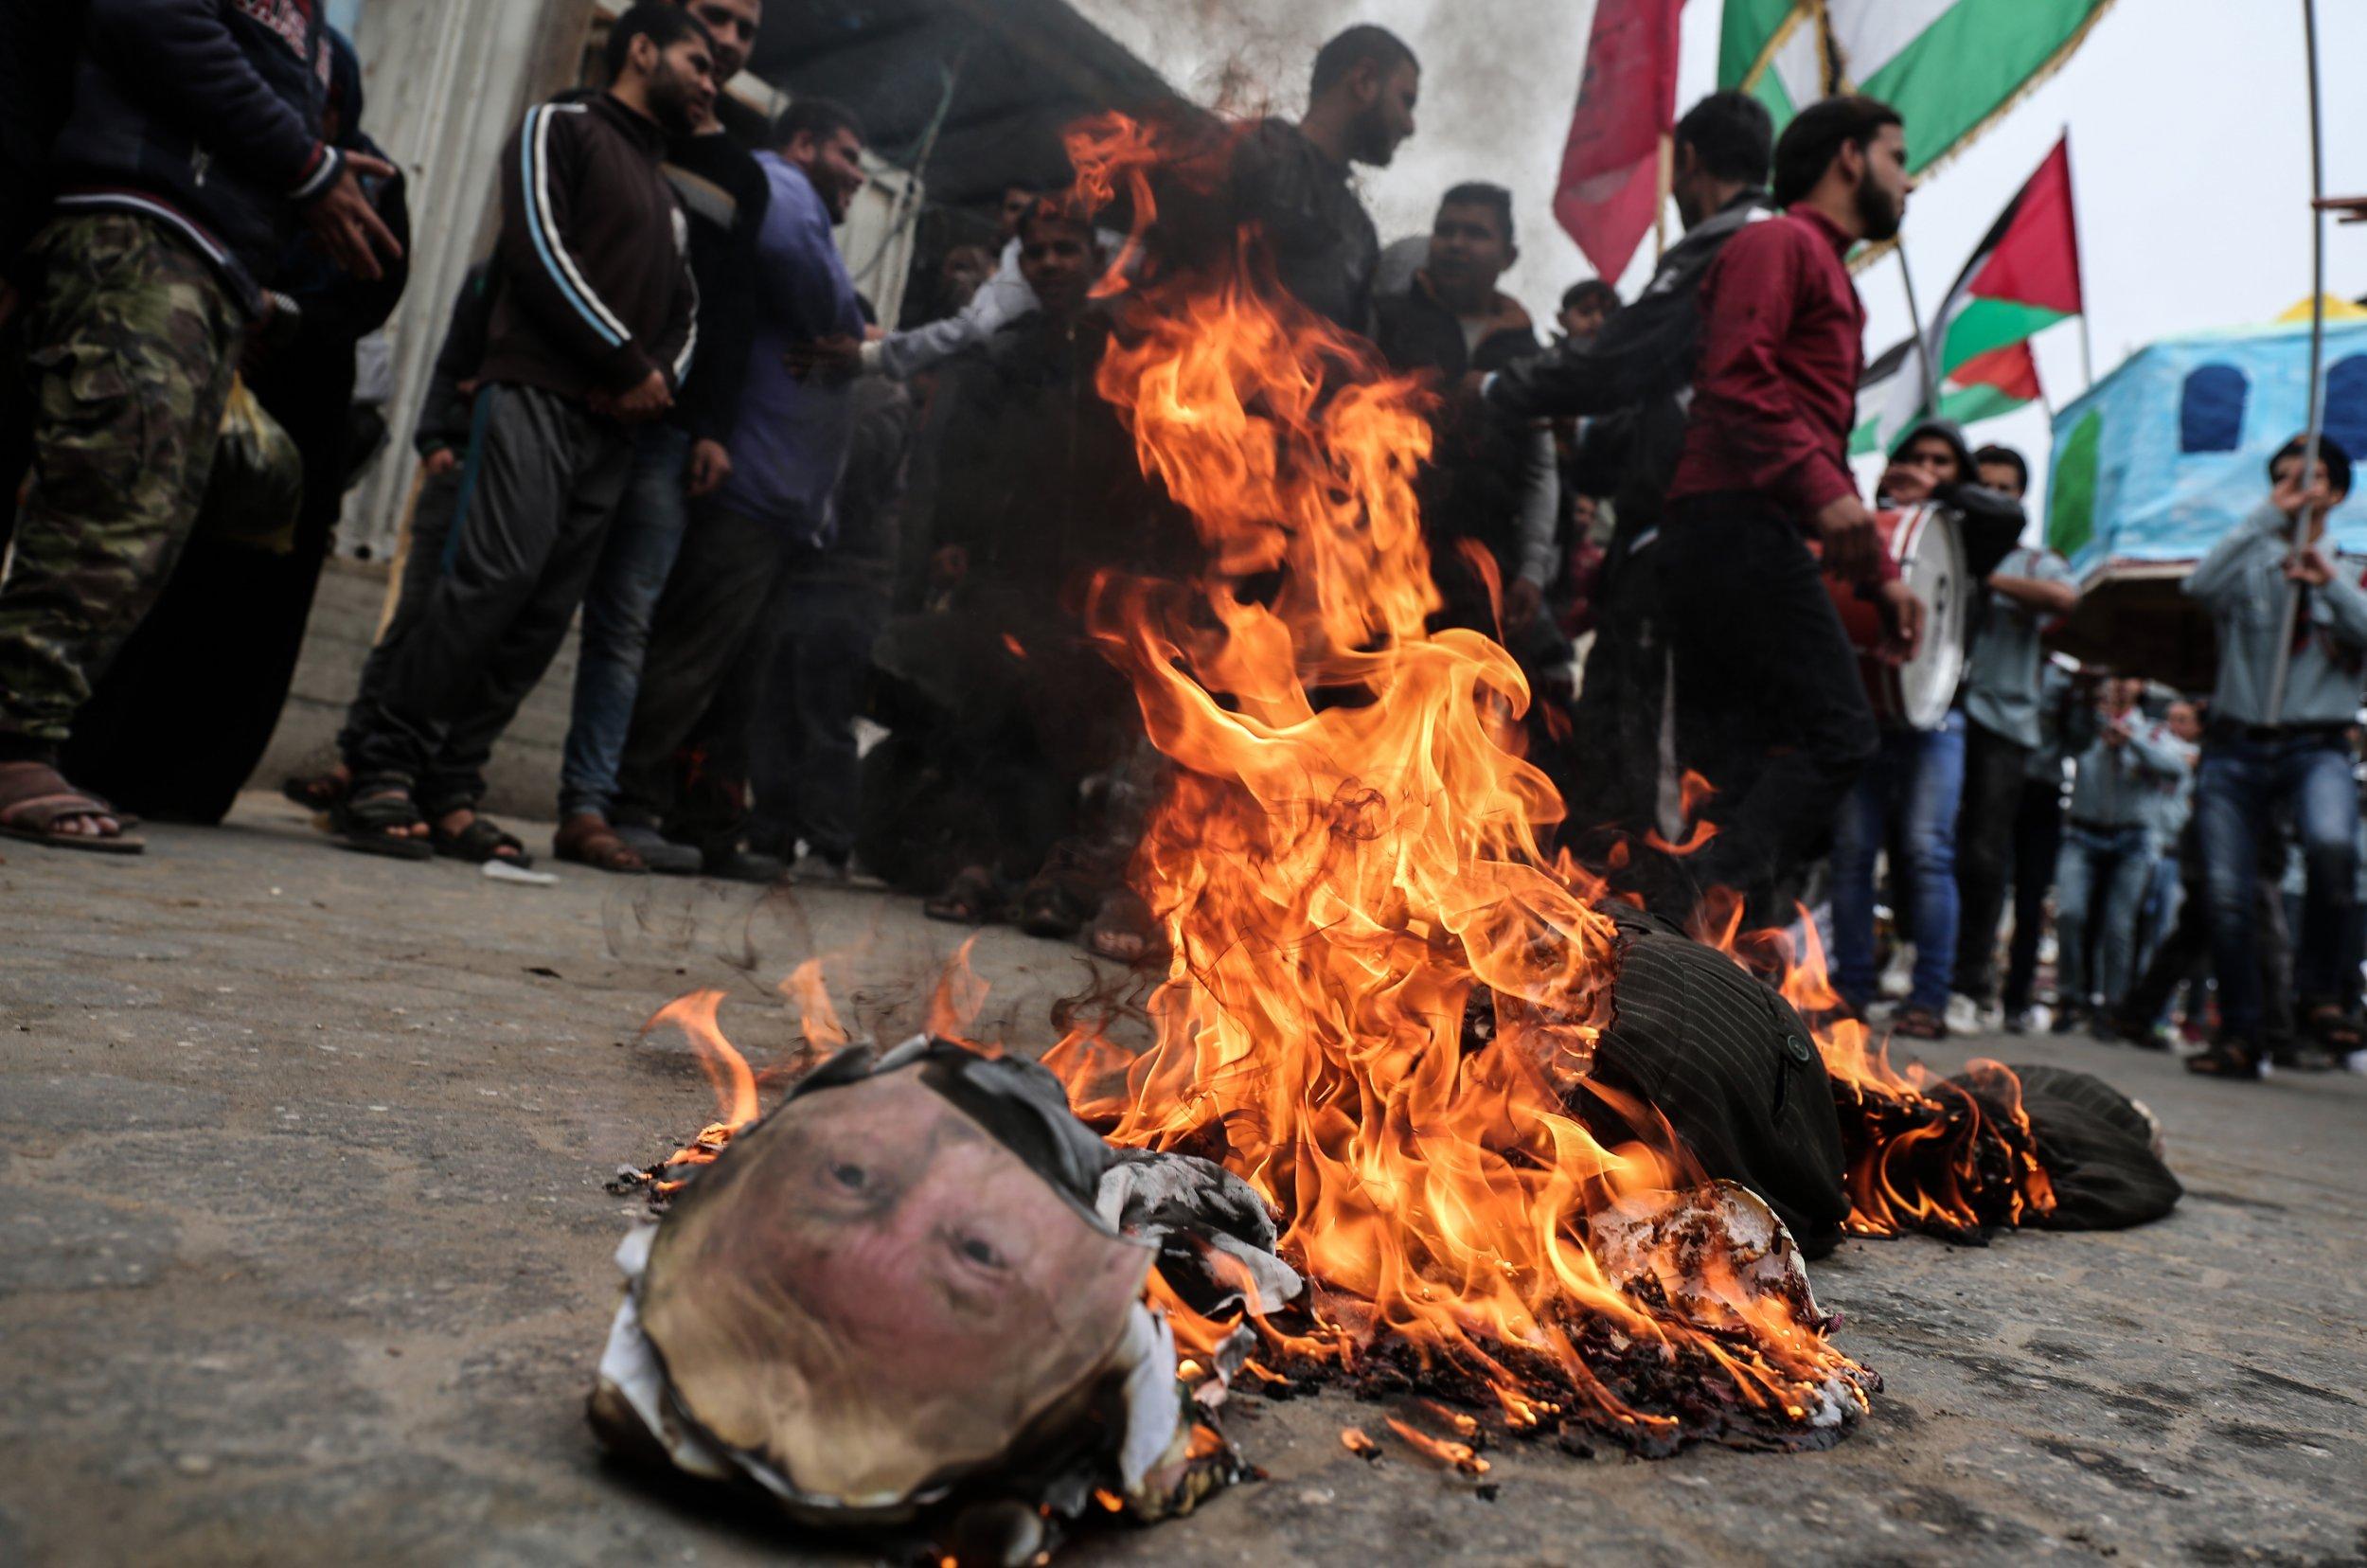 Palestinian demonstrators burn an effigy depicting U.S. President Donald Trump